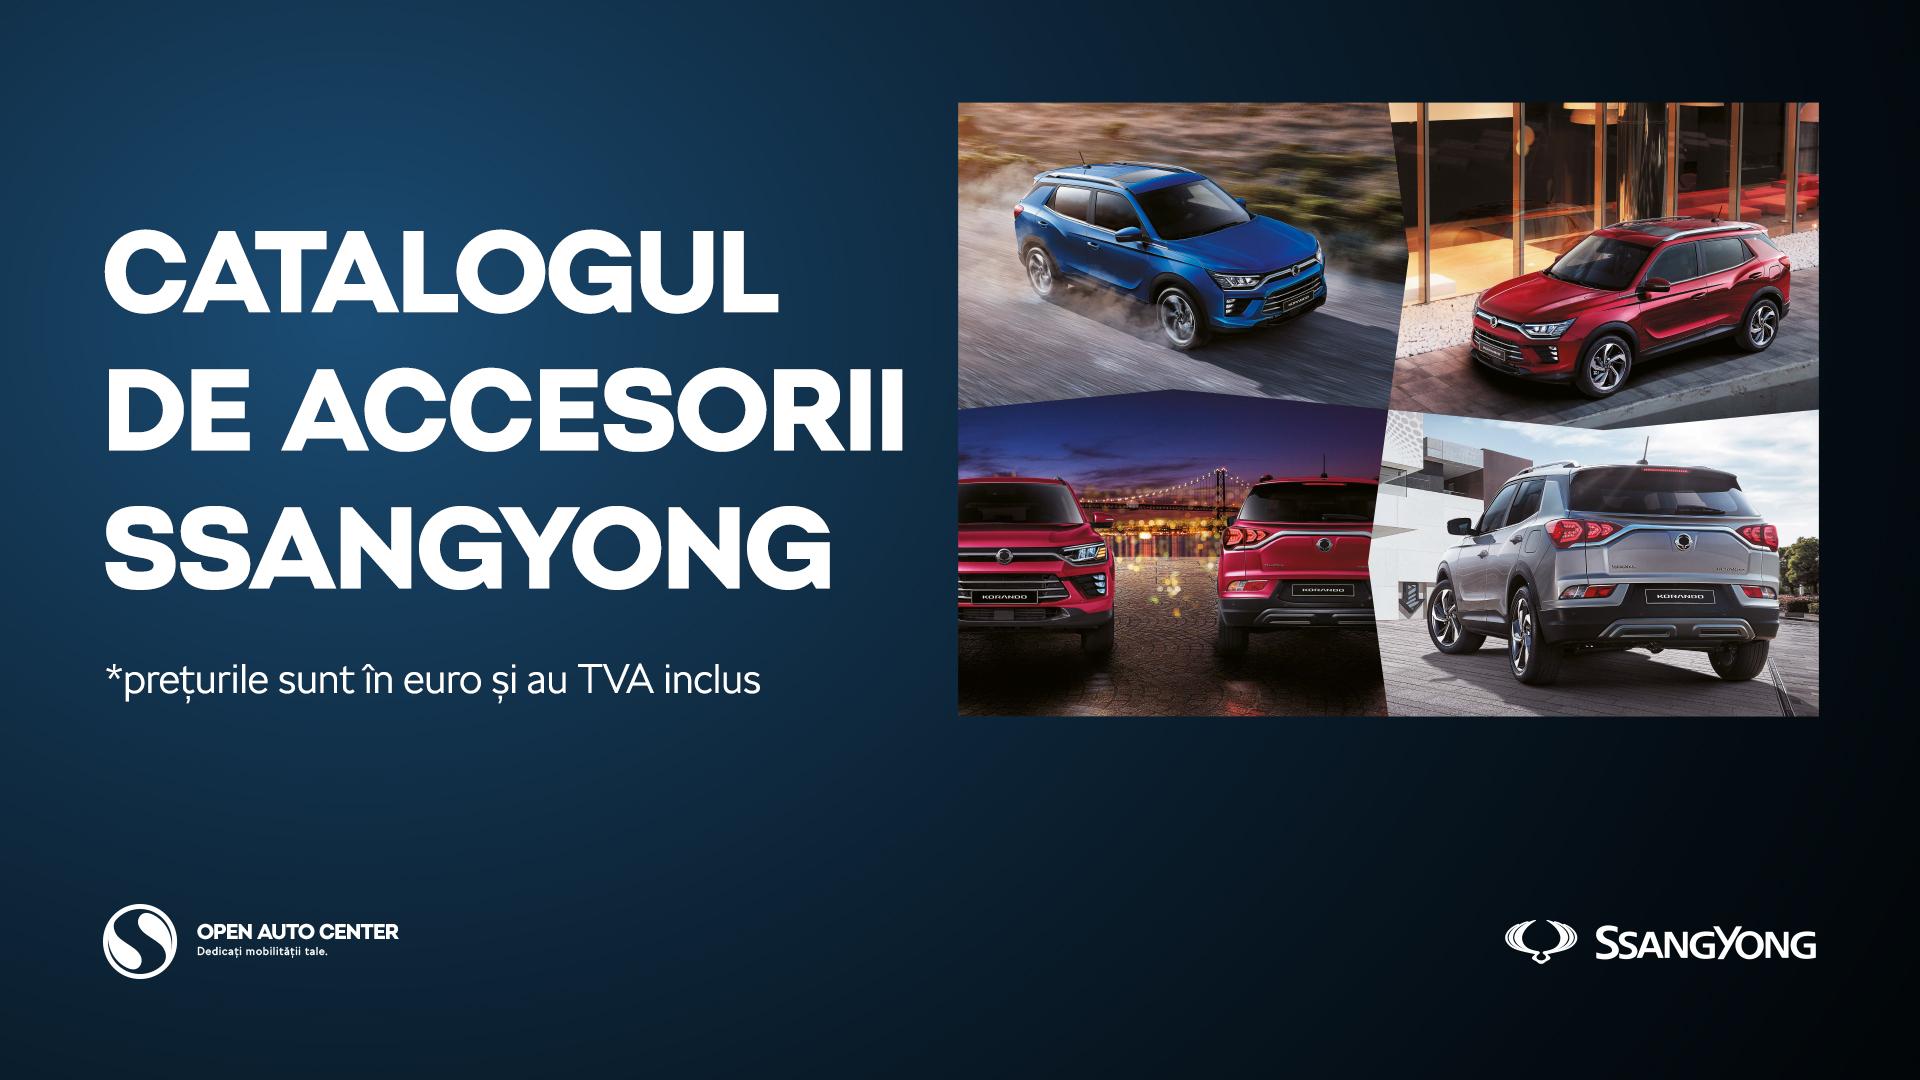 catalog-de-accesorii-ssangyong